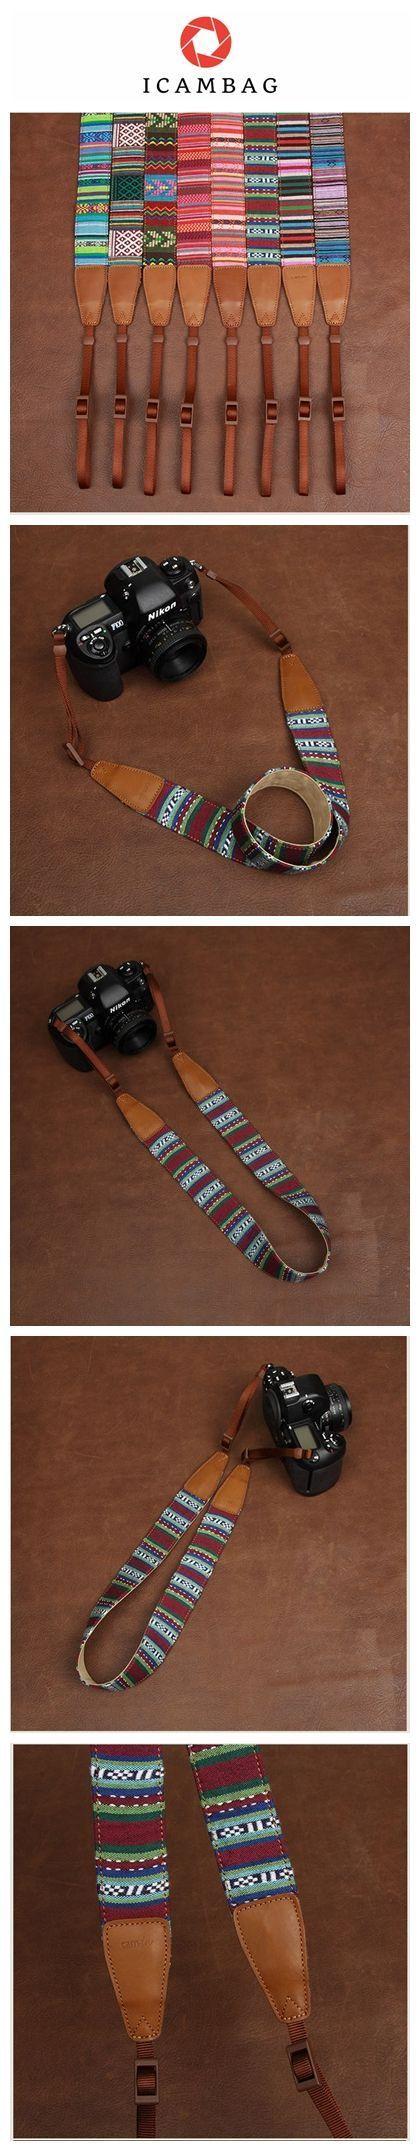 63 Best Cameratas Images On Pinterest Digital Slr Cameras Camera Lowepro Flipside 300 Aw Ii Camo Tas Kamera Blue Strap Sony Handmade Leather Bohemia Style Holiday 7226